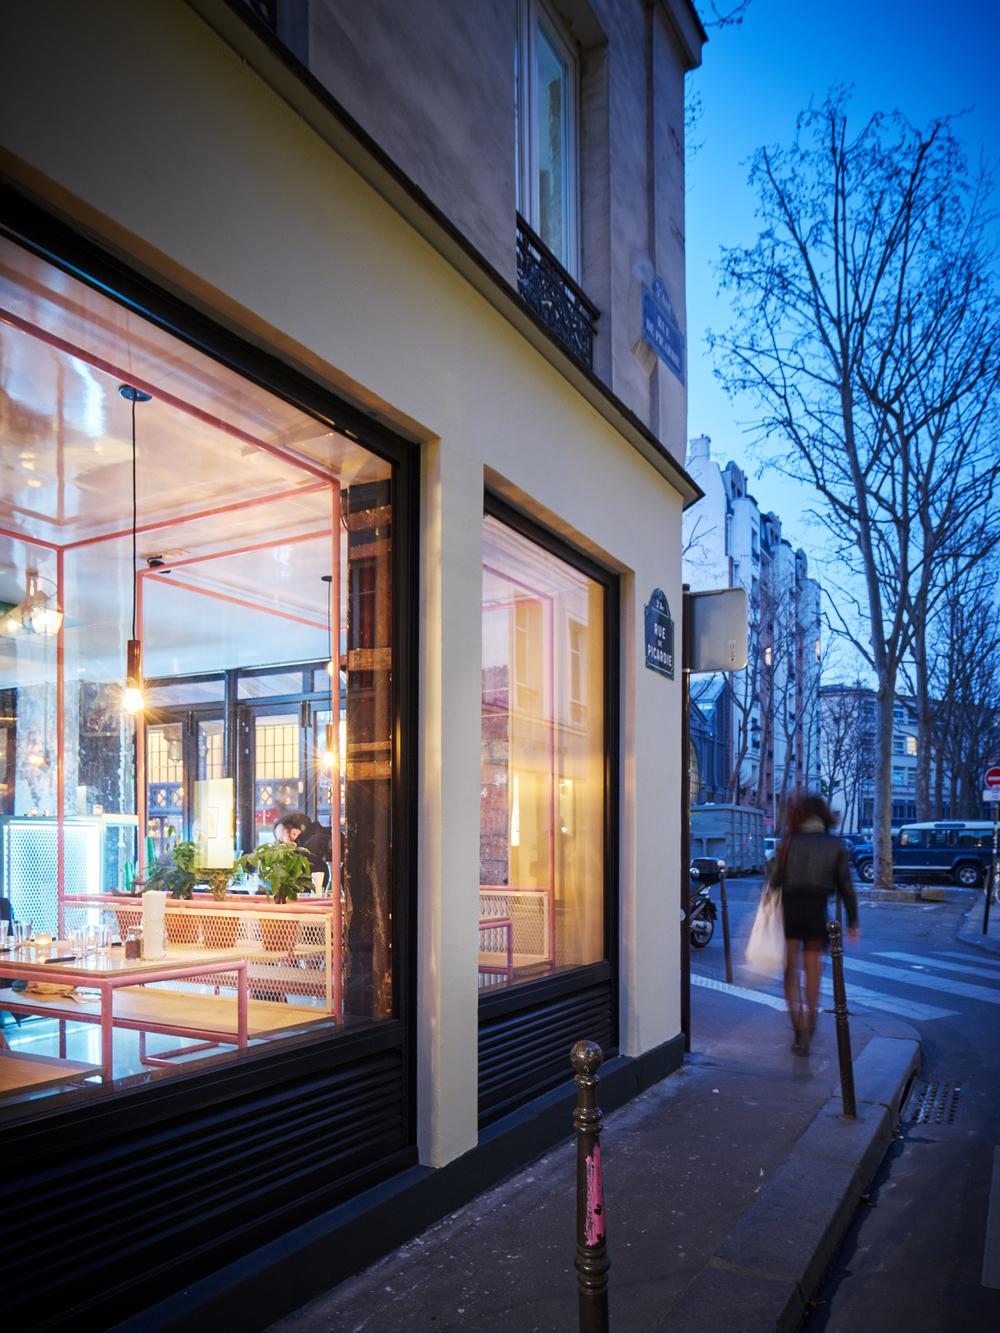 027Cut Architecture_PNY Marais _039Copyright David foessel.jpg